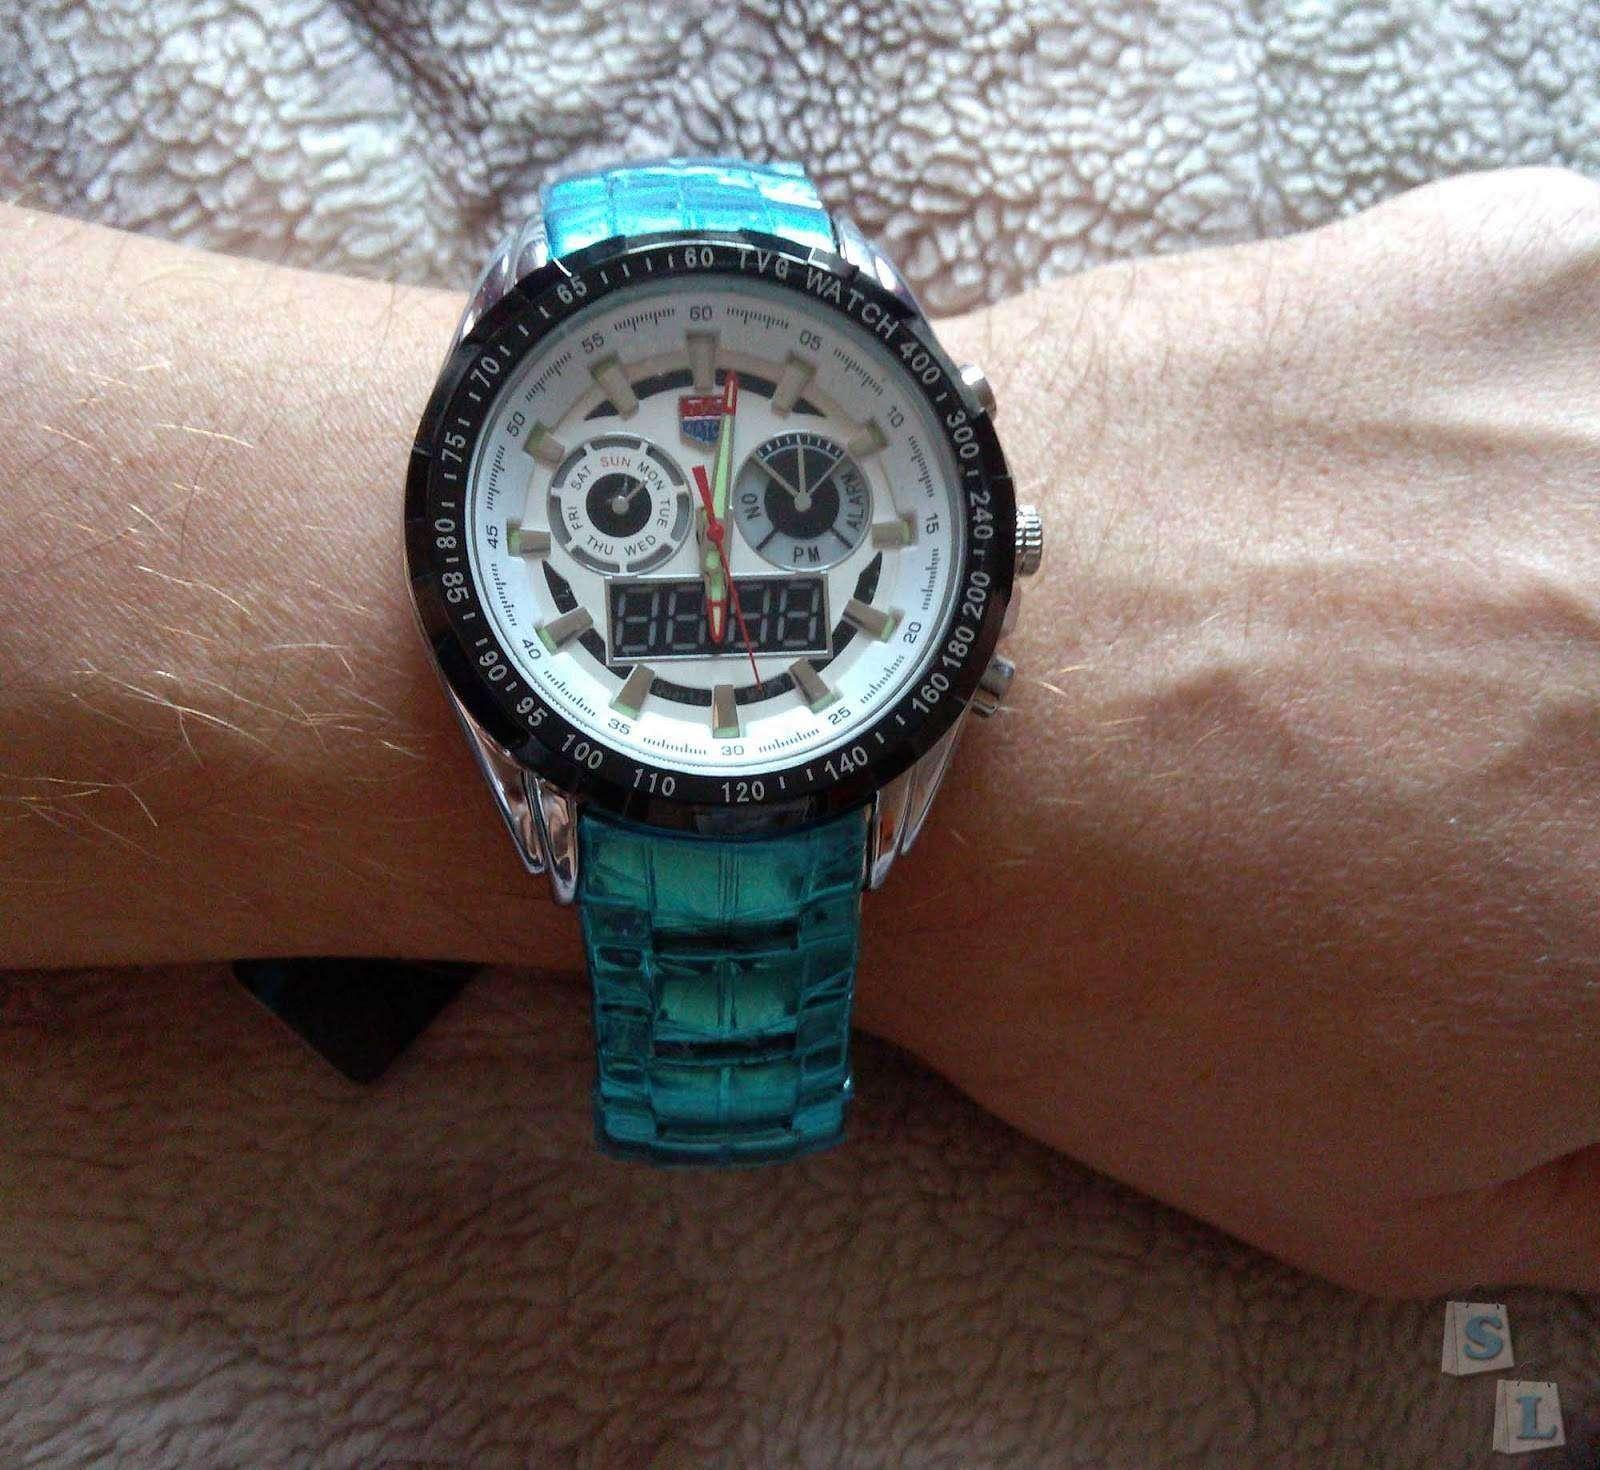 GearBest: Tvg KM- 579  часы с двойным механизмом